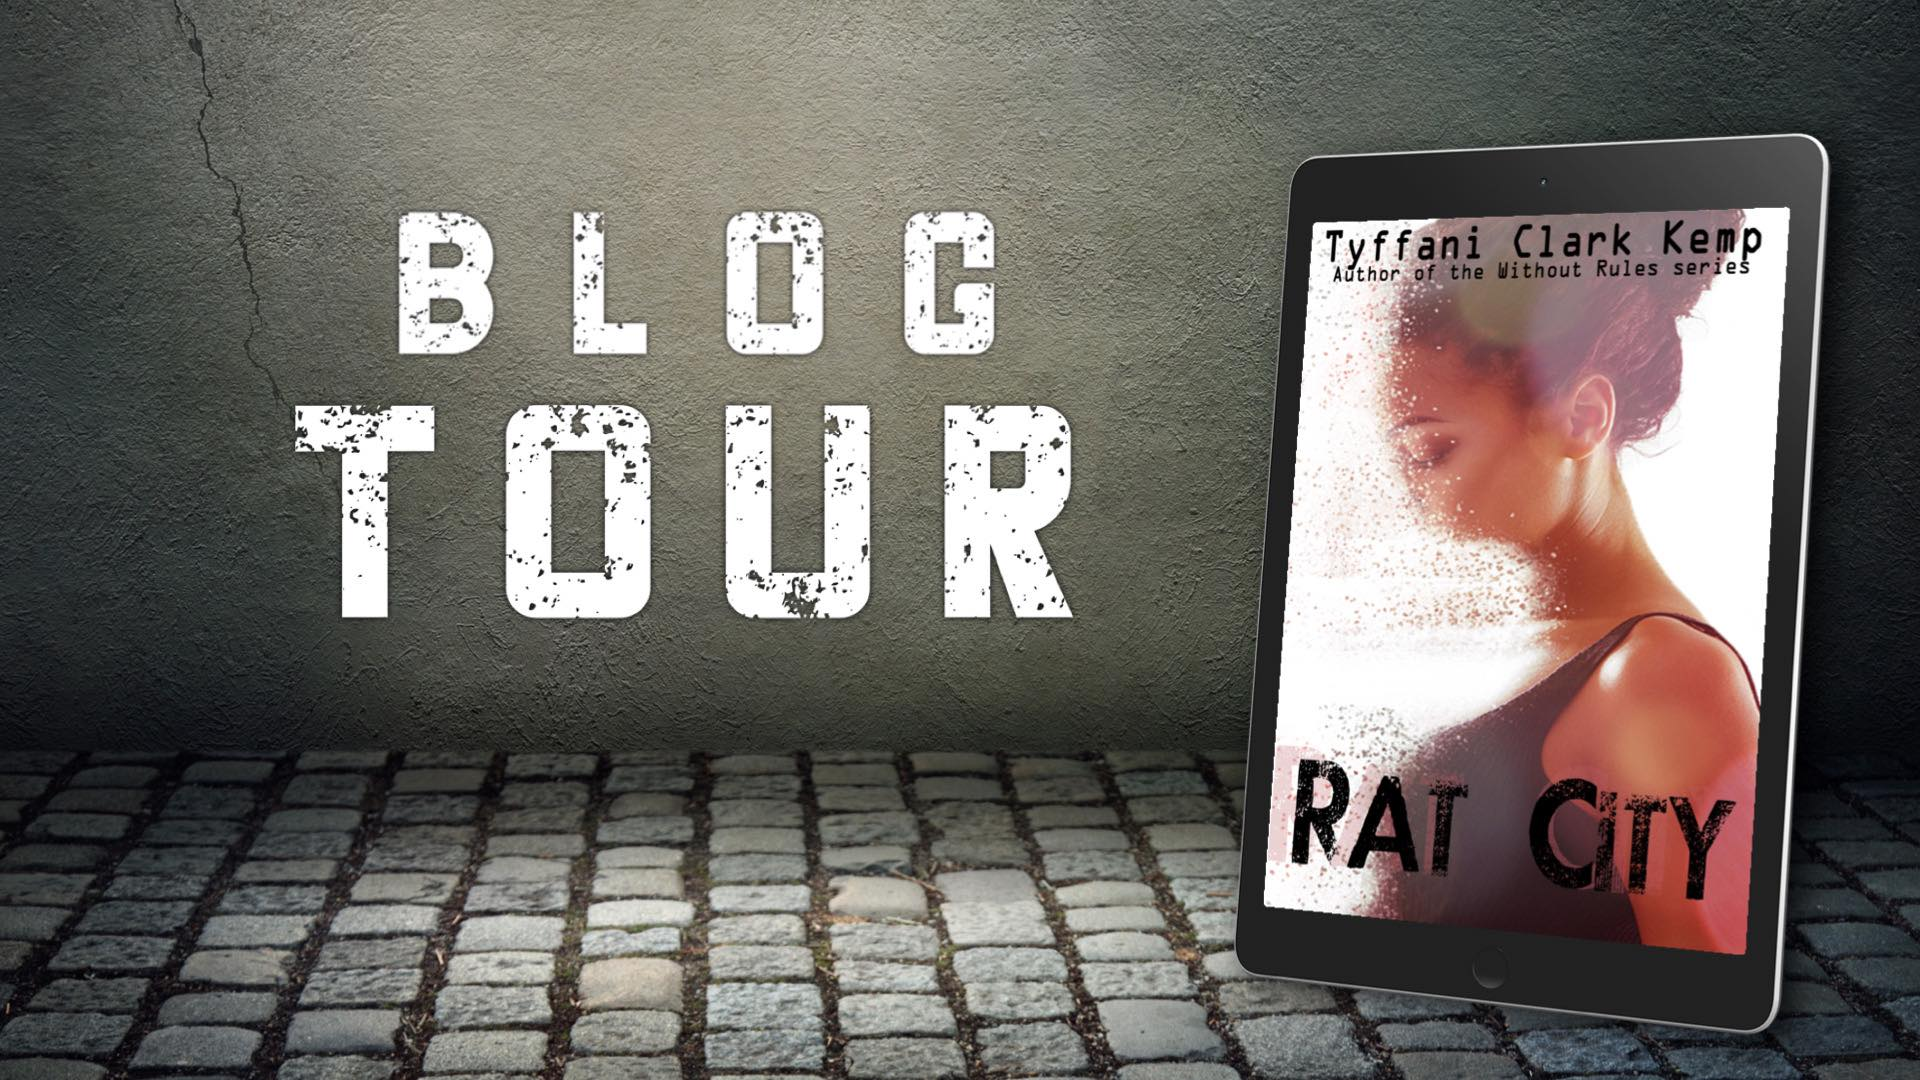 rat city tour